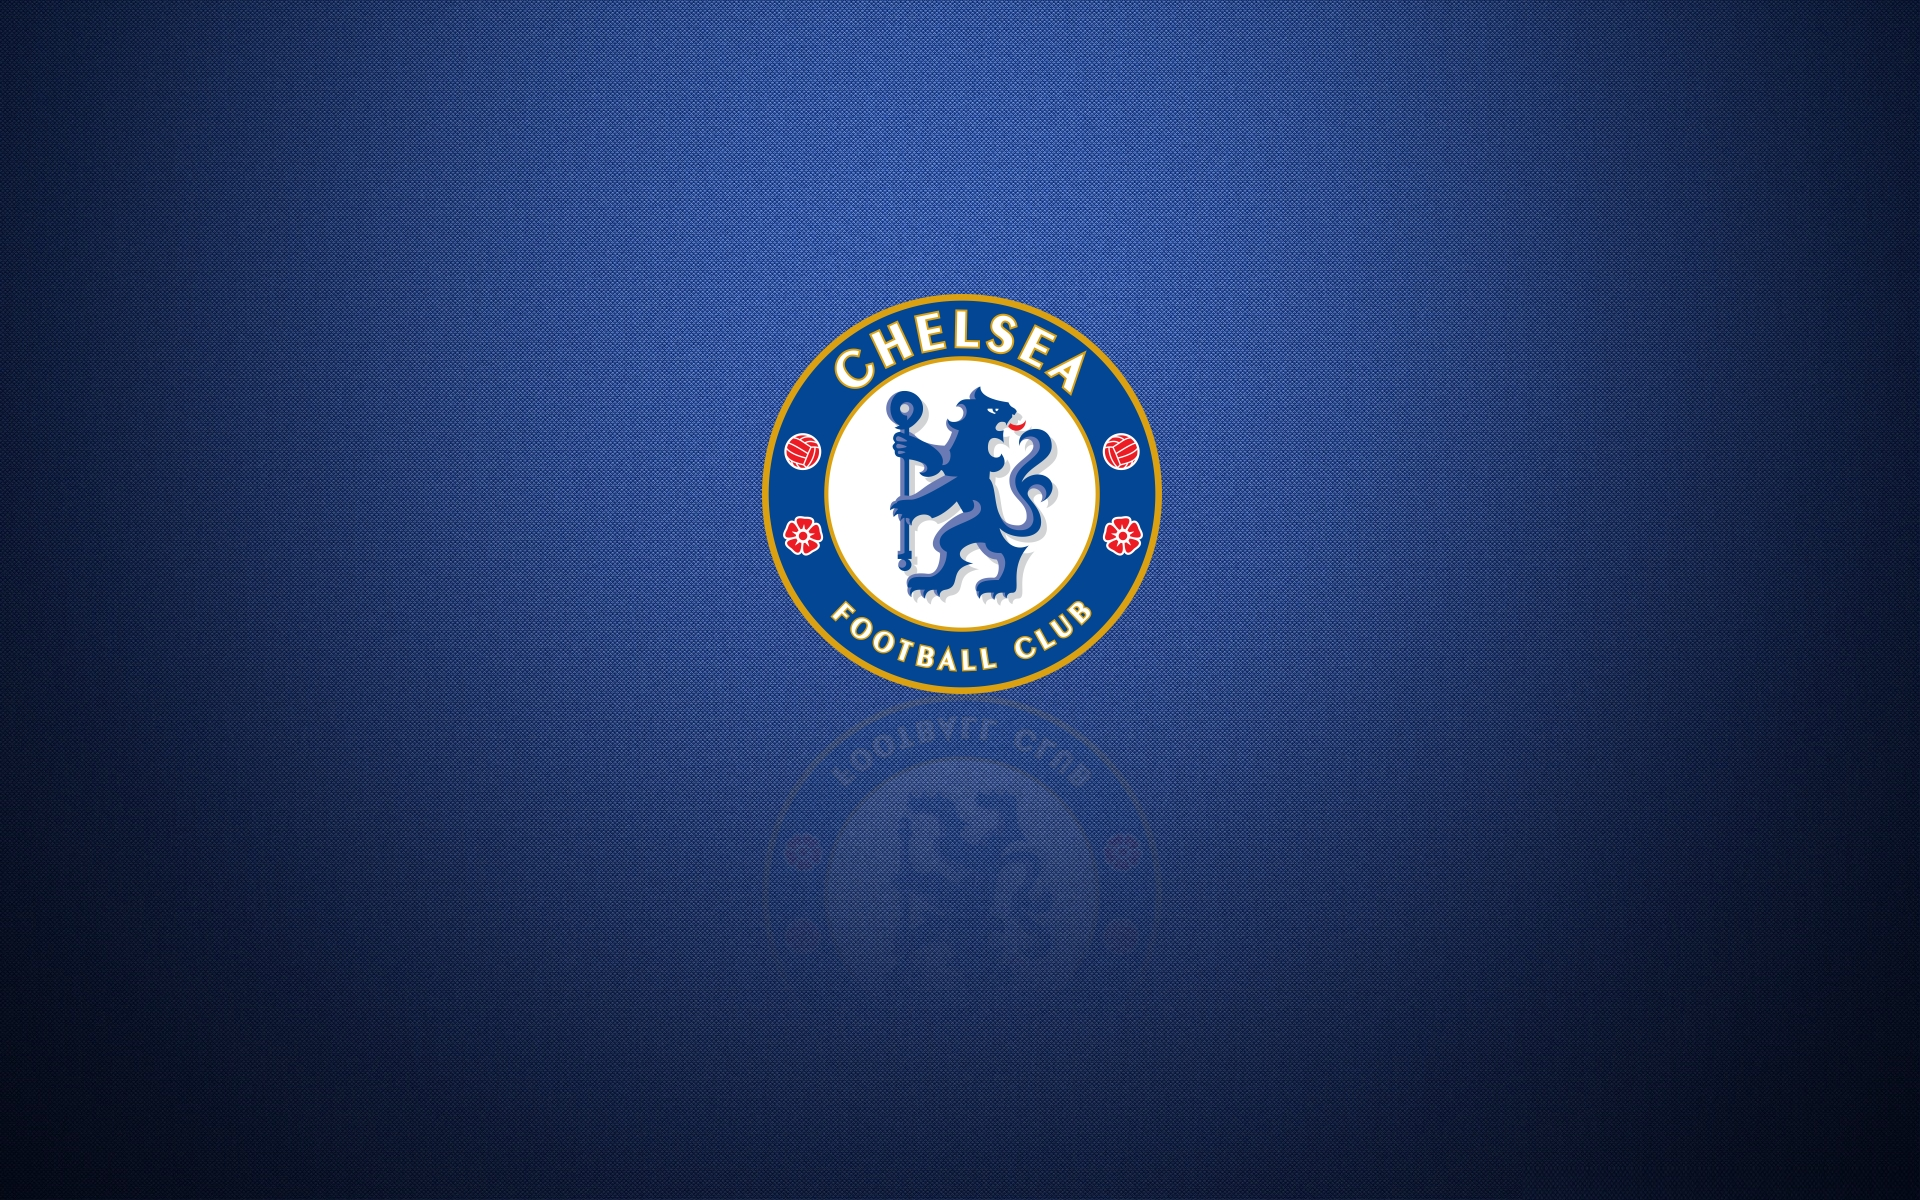 74+ Chelsea Logo Wallpaper on WallpaperSafari